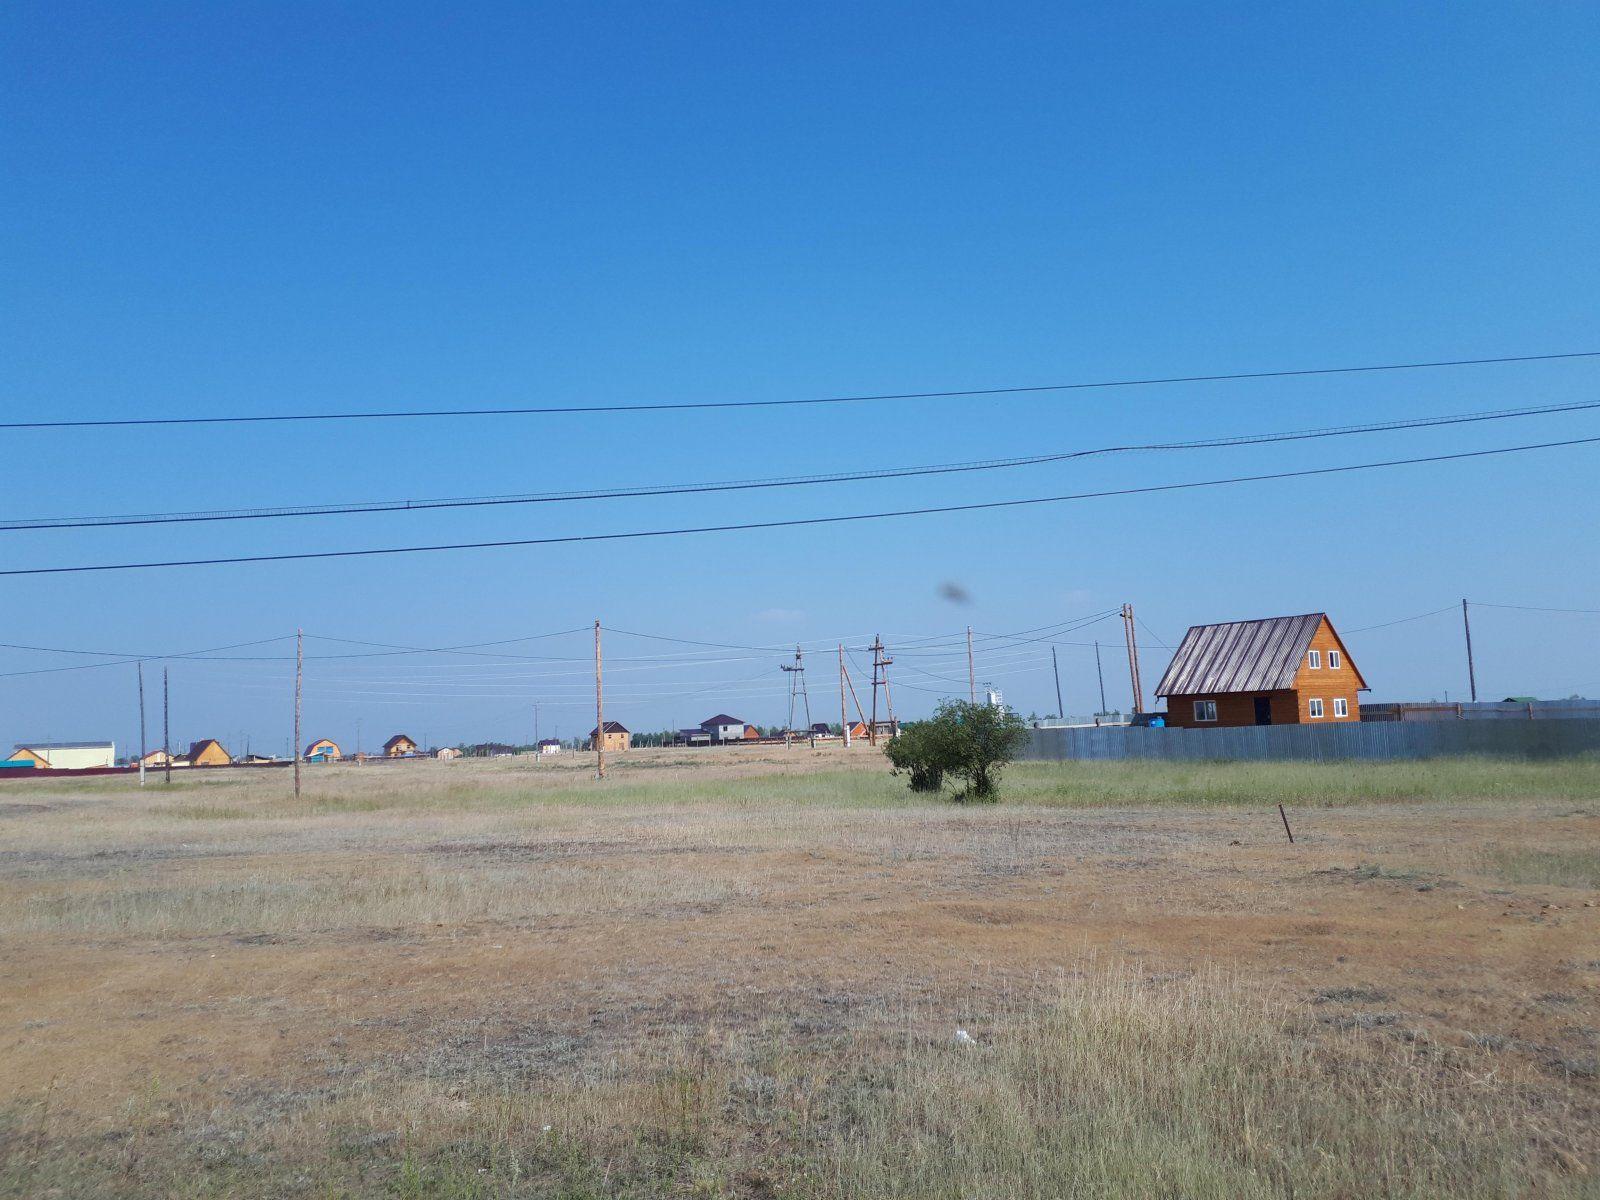 СОТ Якутска: «Якутскэнерго» не принимает наши электросети на баланс